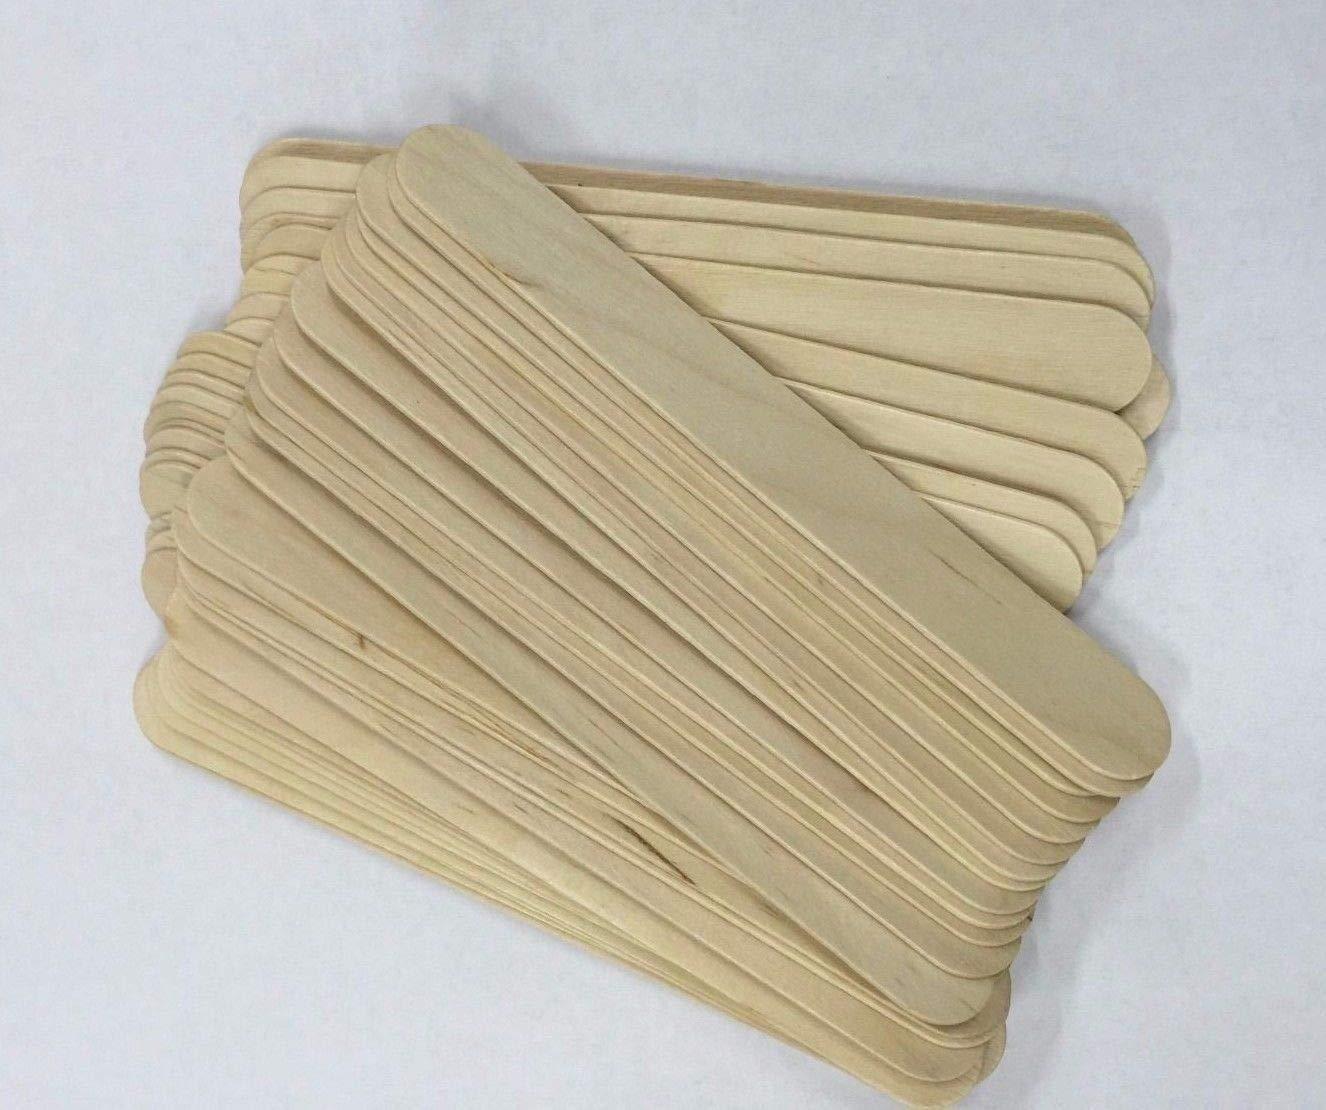 *Beauticom USA Base* BULK LARGE Wide Wood Wax Spatula Applicator 6'' x 3/4'' (10,000 pieces)